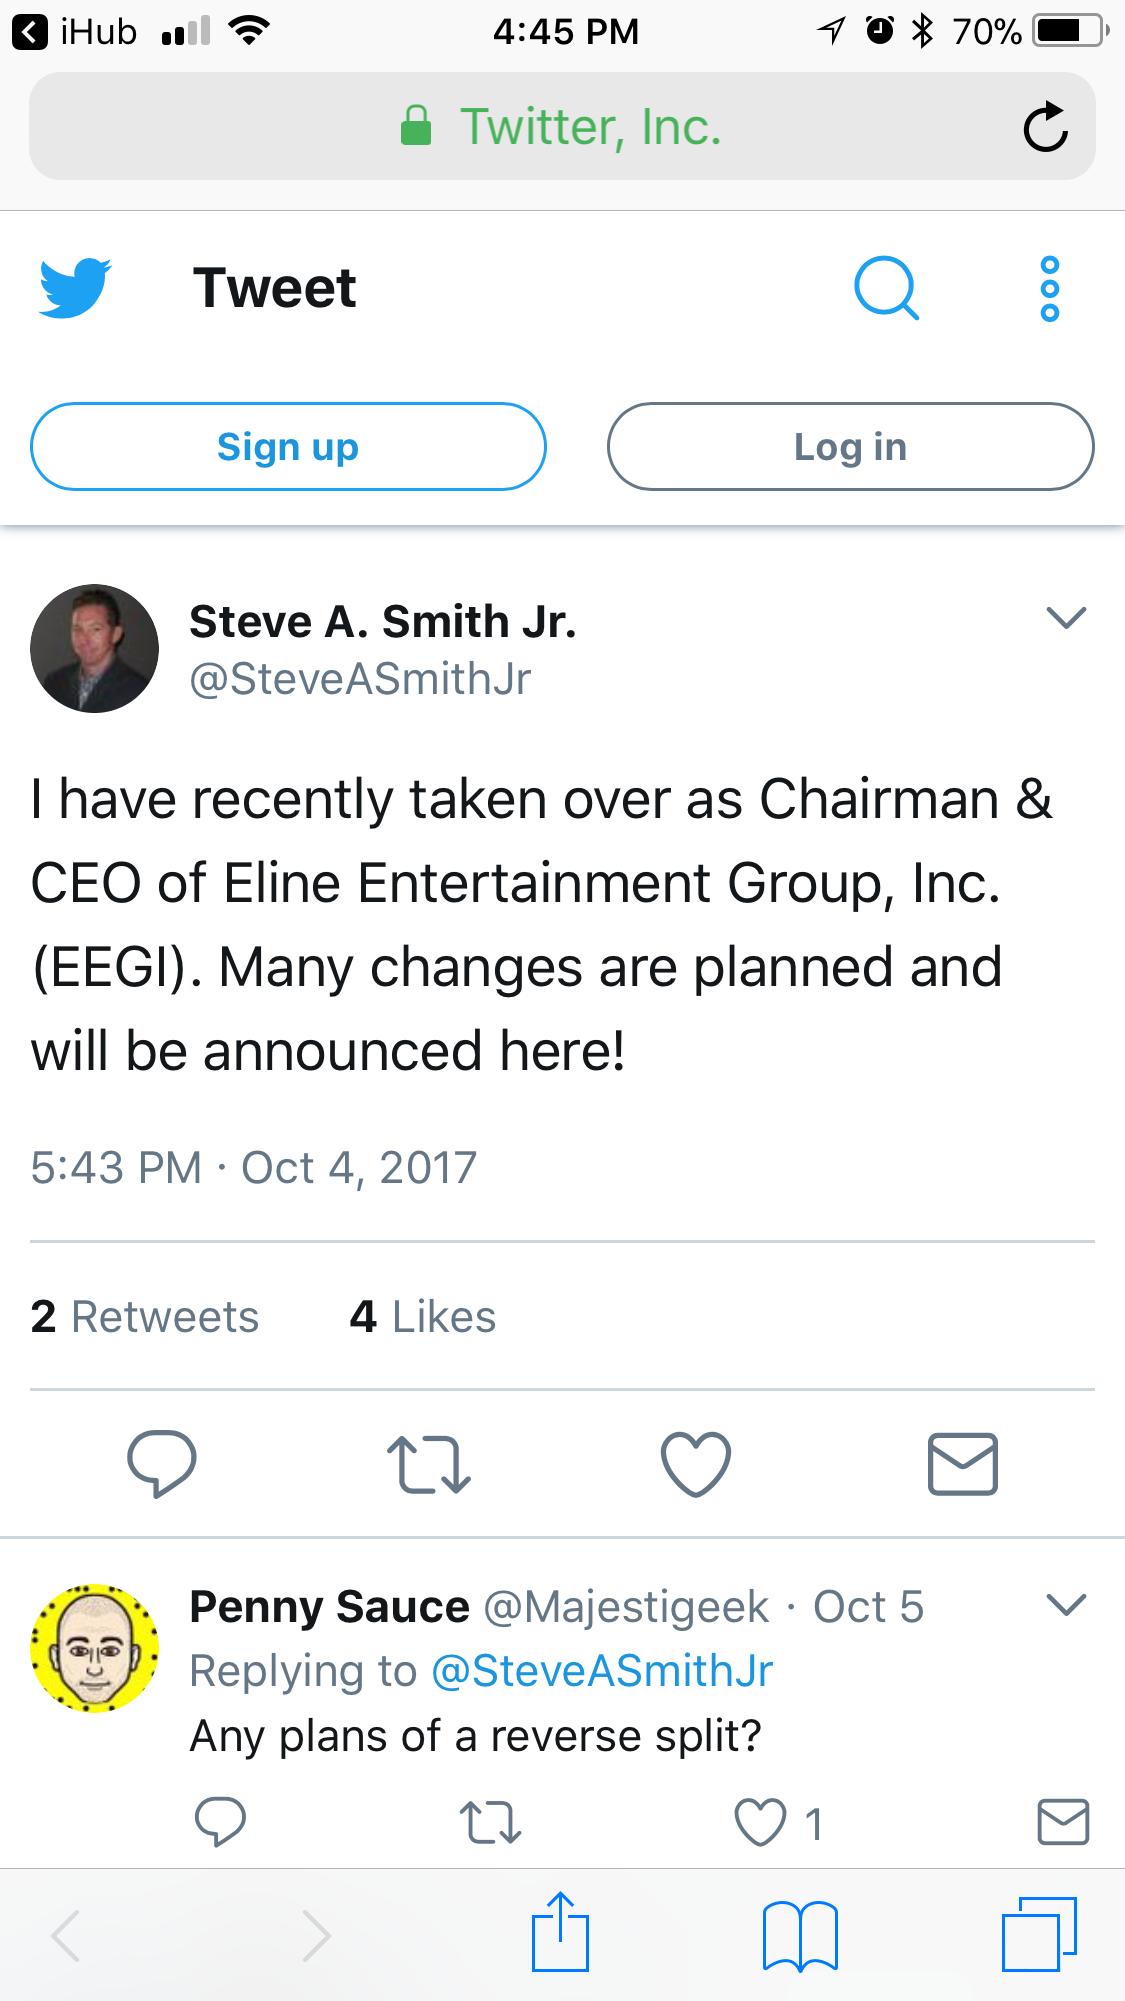 https://investorshub.advfn.com/uimage/uploads/2017/10/14/wryvg7CF787A8-218E-4EB2-8C4B-F41B85A296CA.png